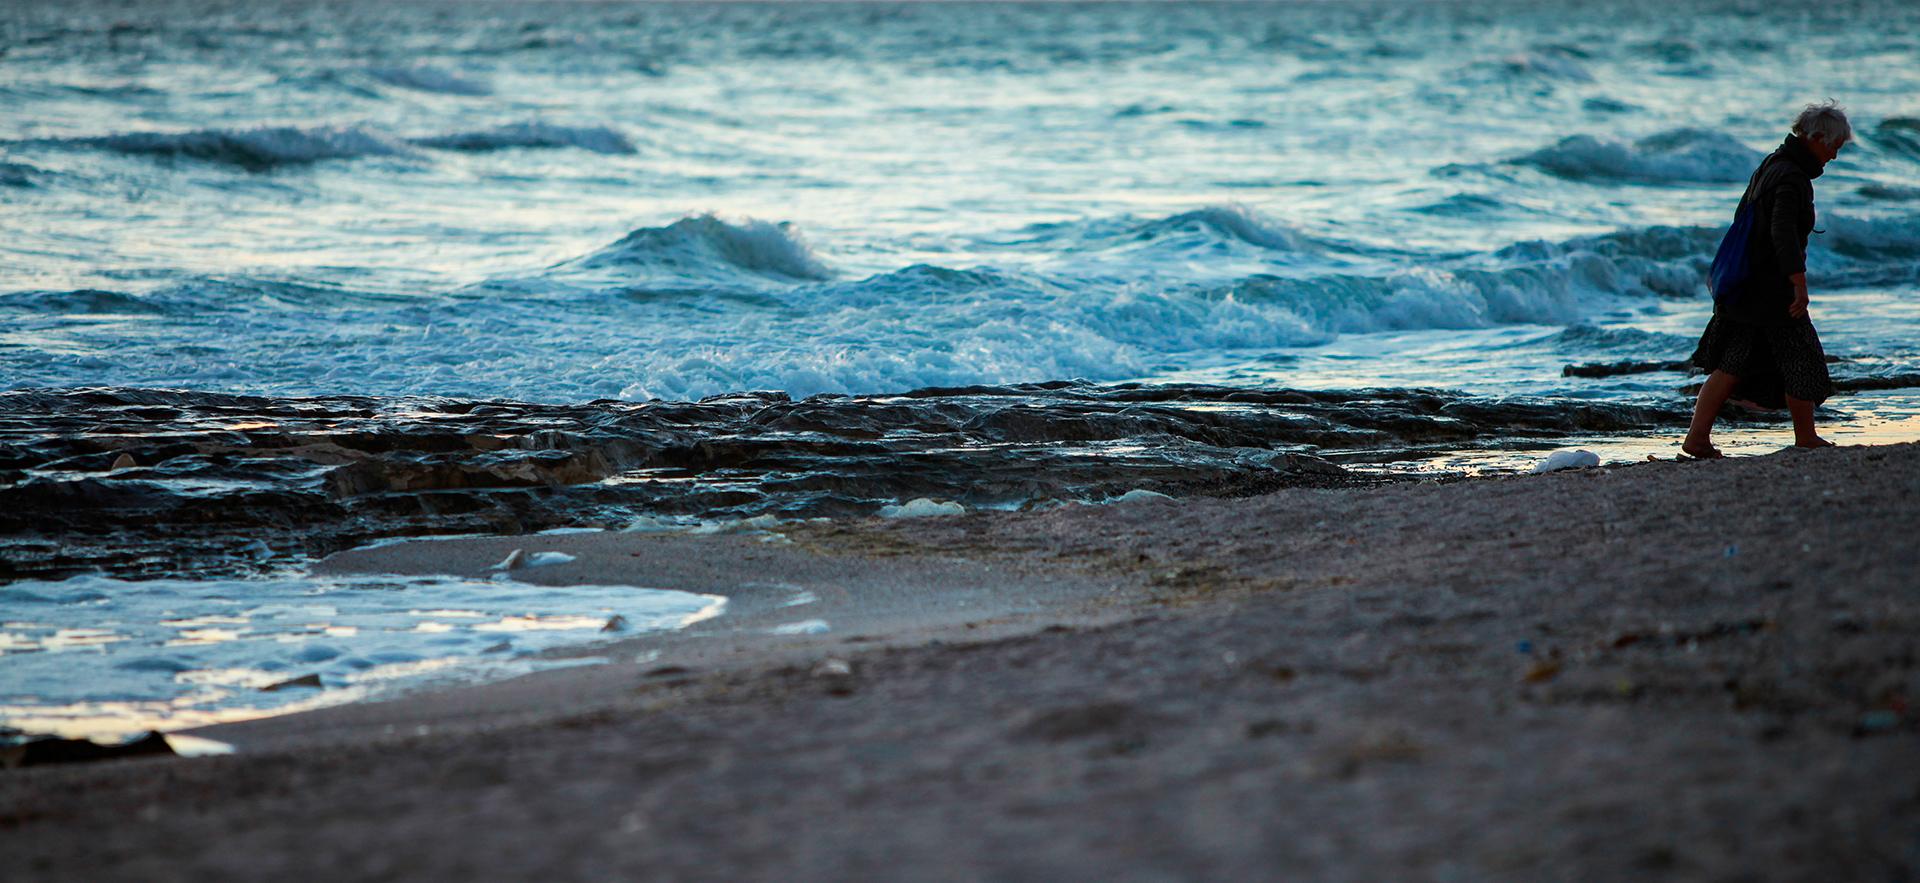 Caspian Sea, Aktau silhouette, woman, old woman at the sea shore